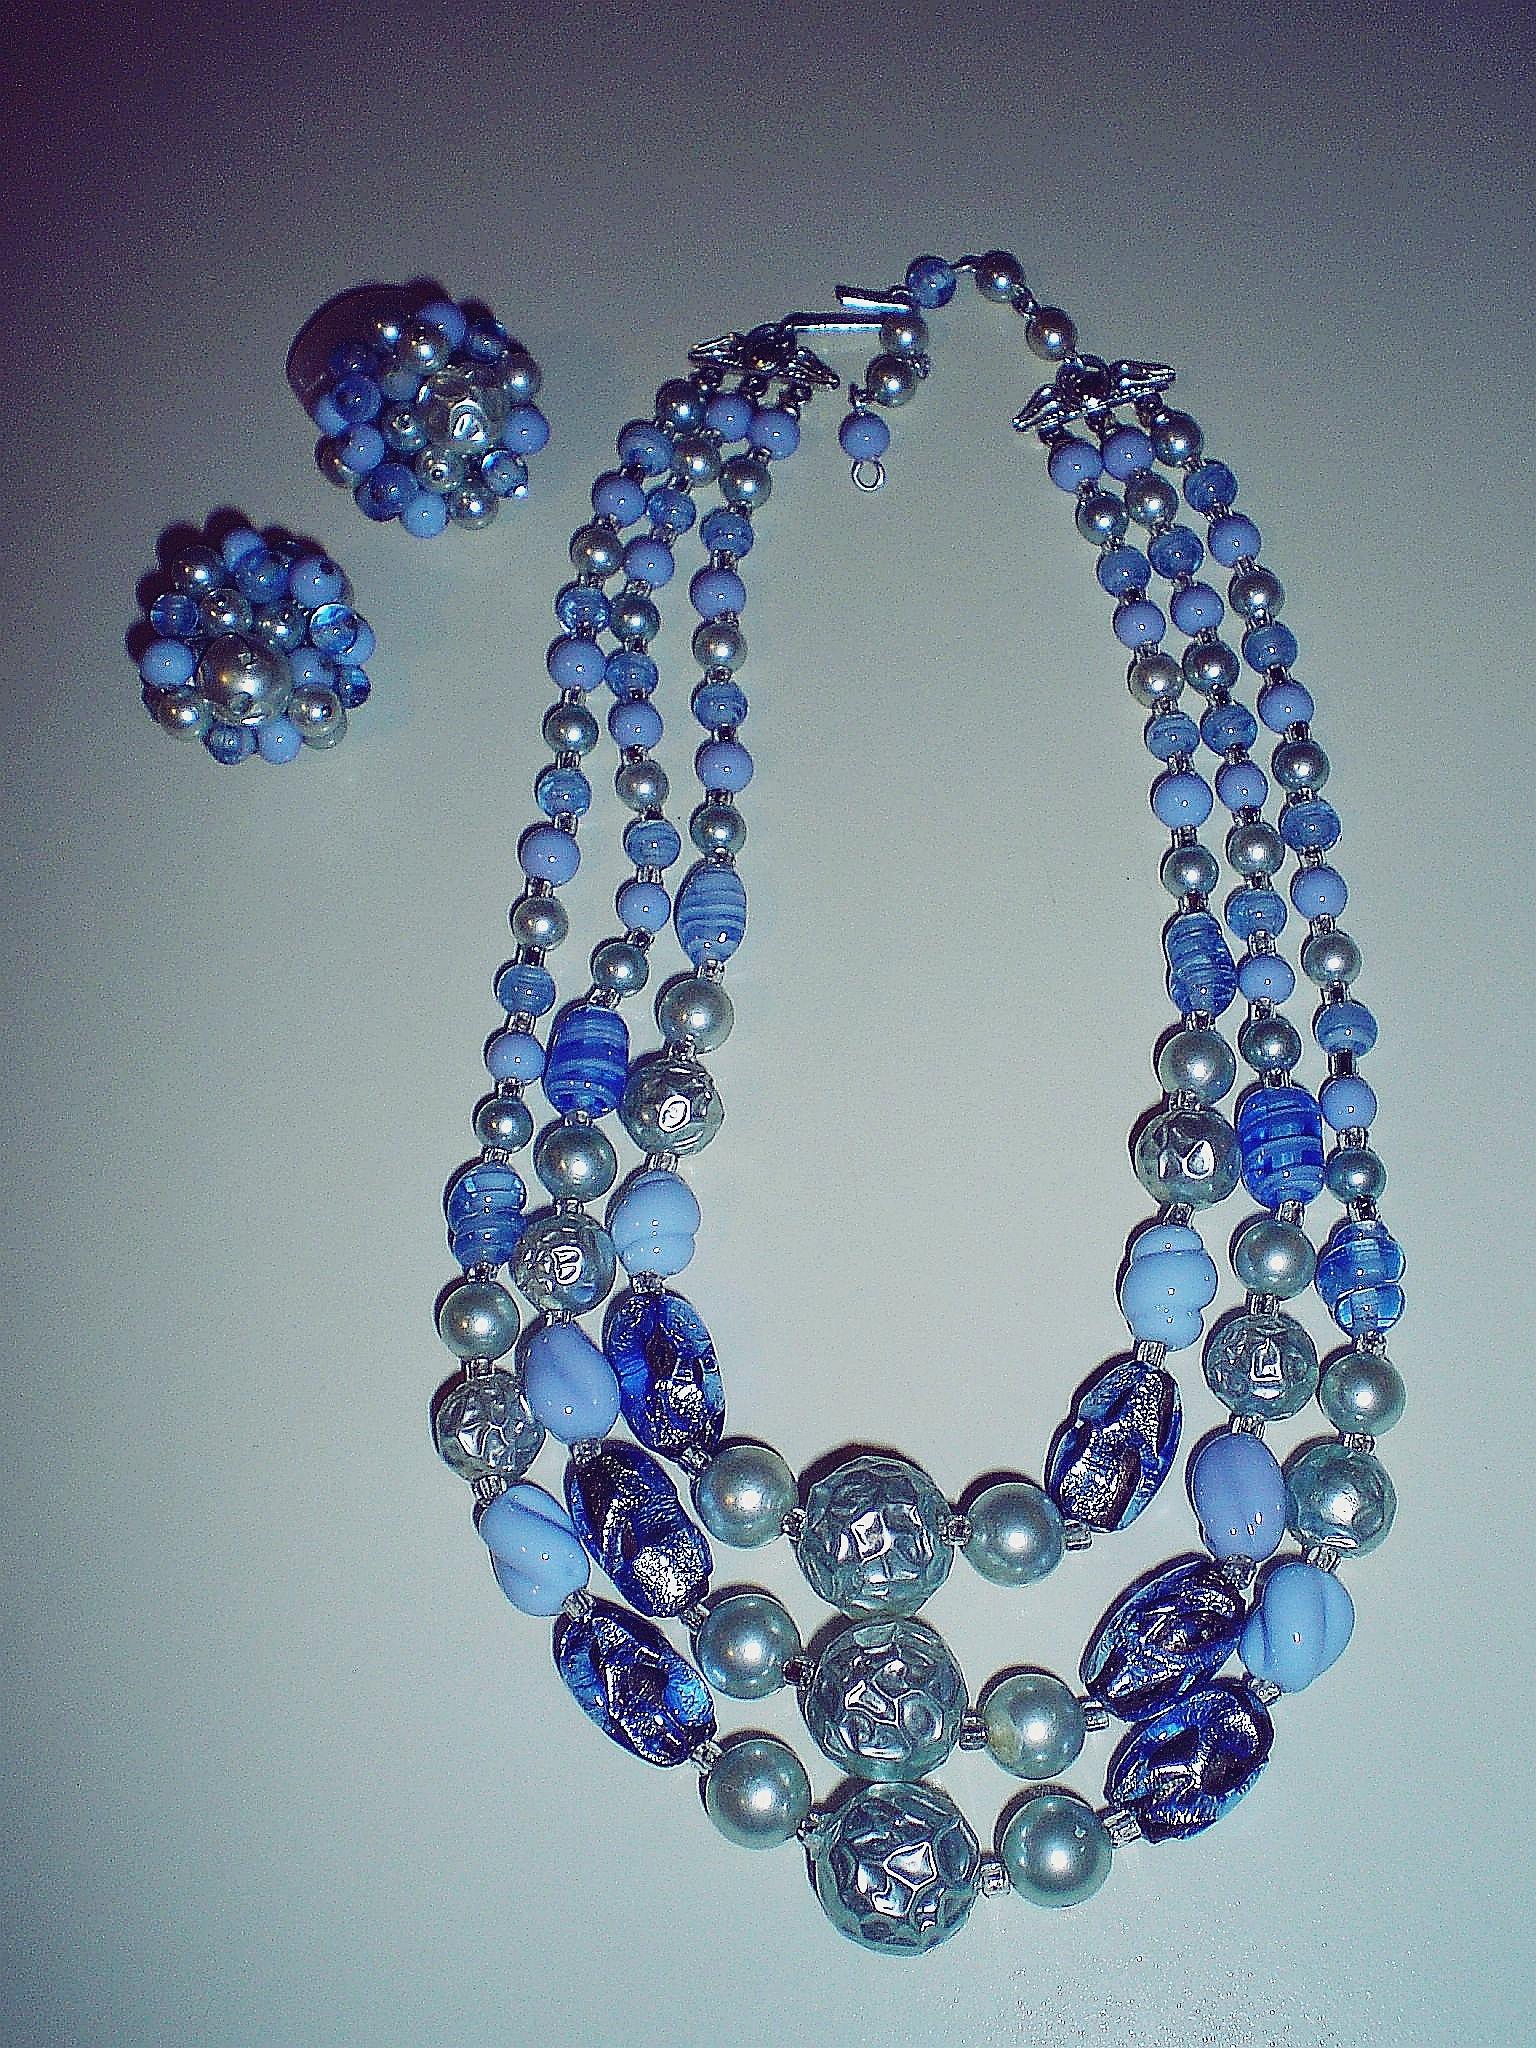 Jewelry & Gemstones OH Fox Jewelry Boutique